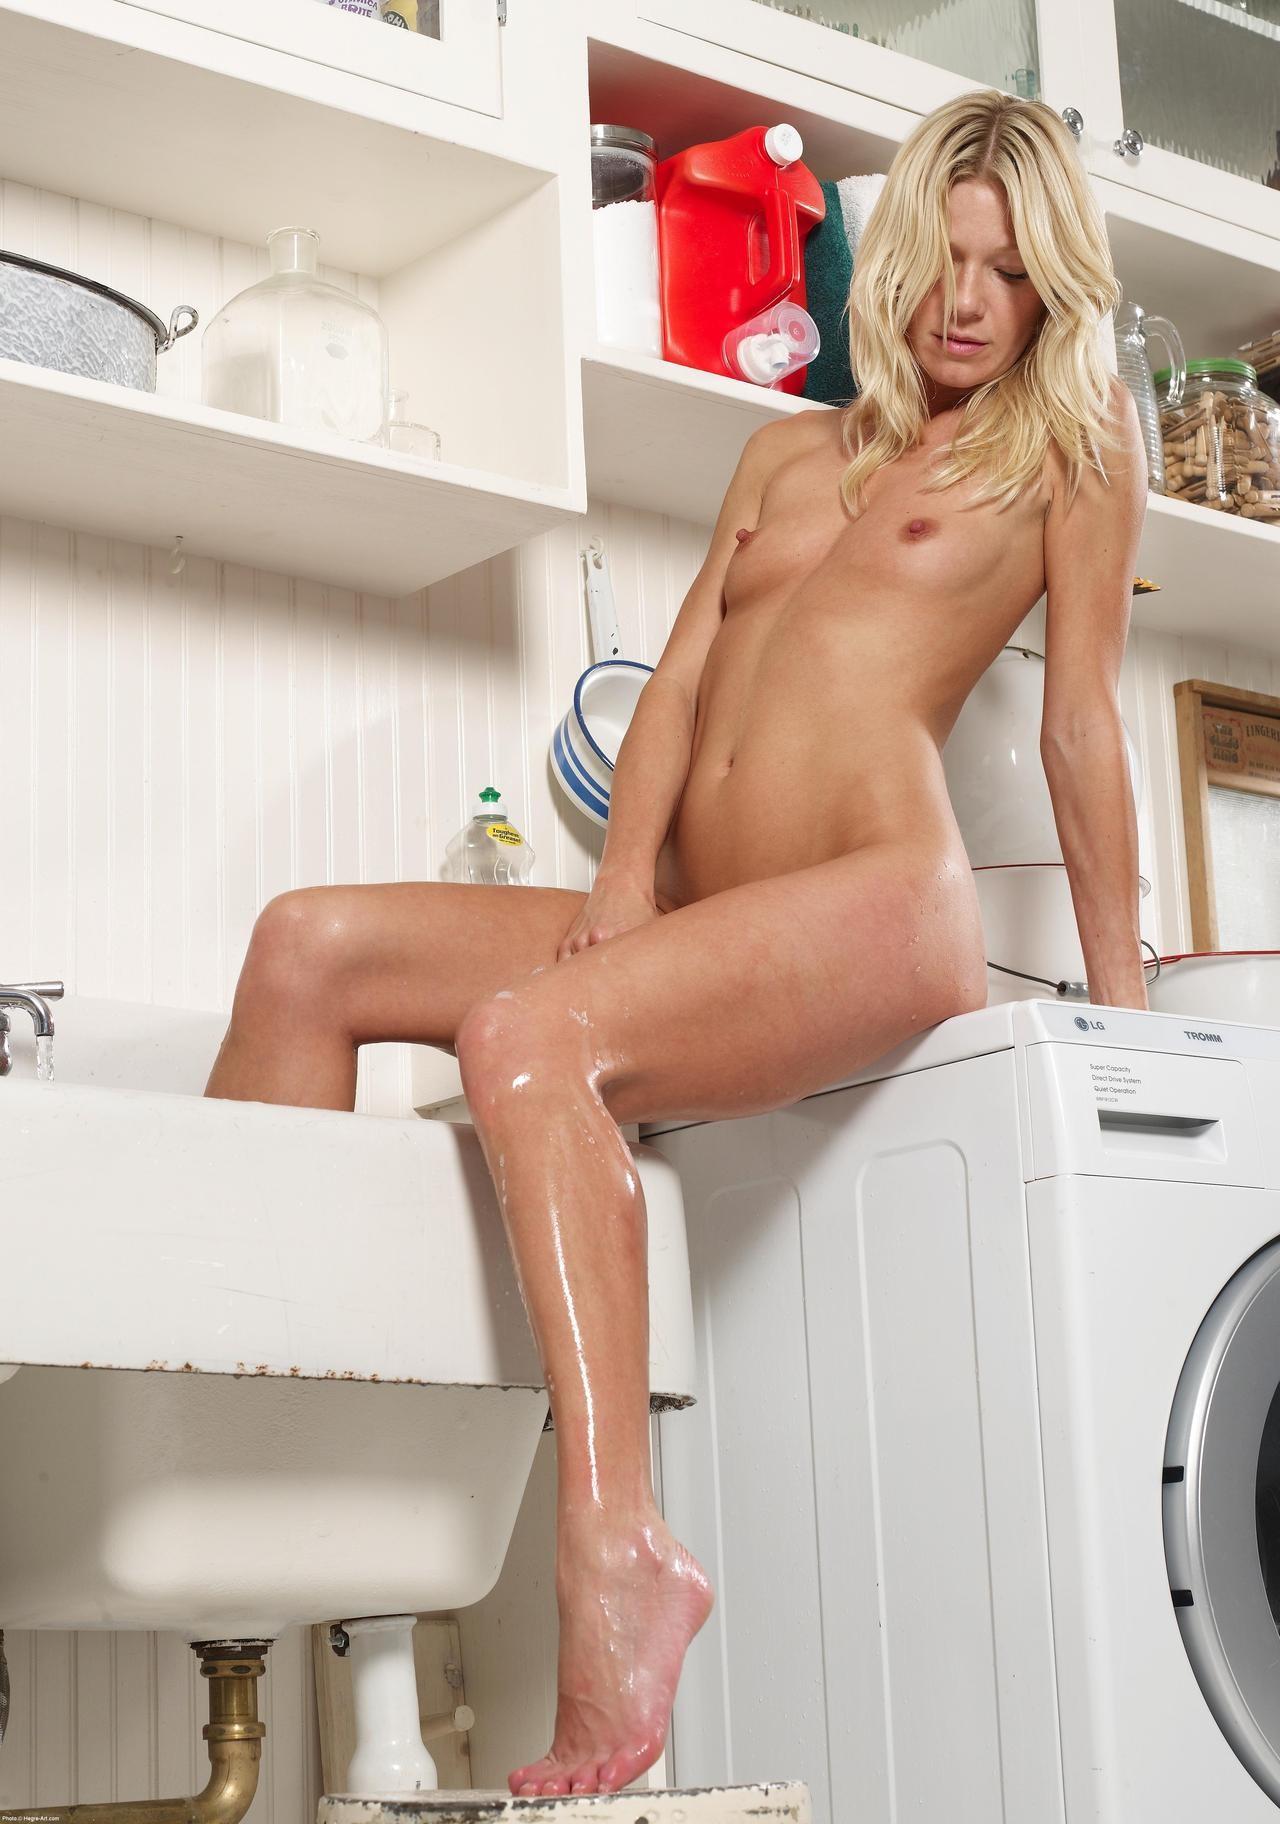 laundry-girls-nude-washing-machine-photo-mix-79